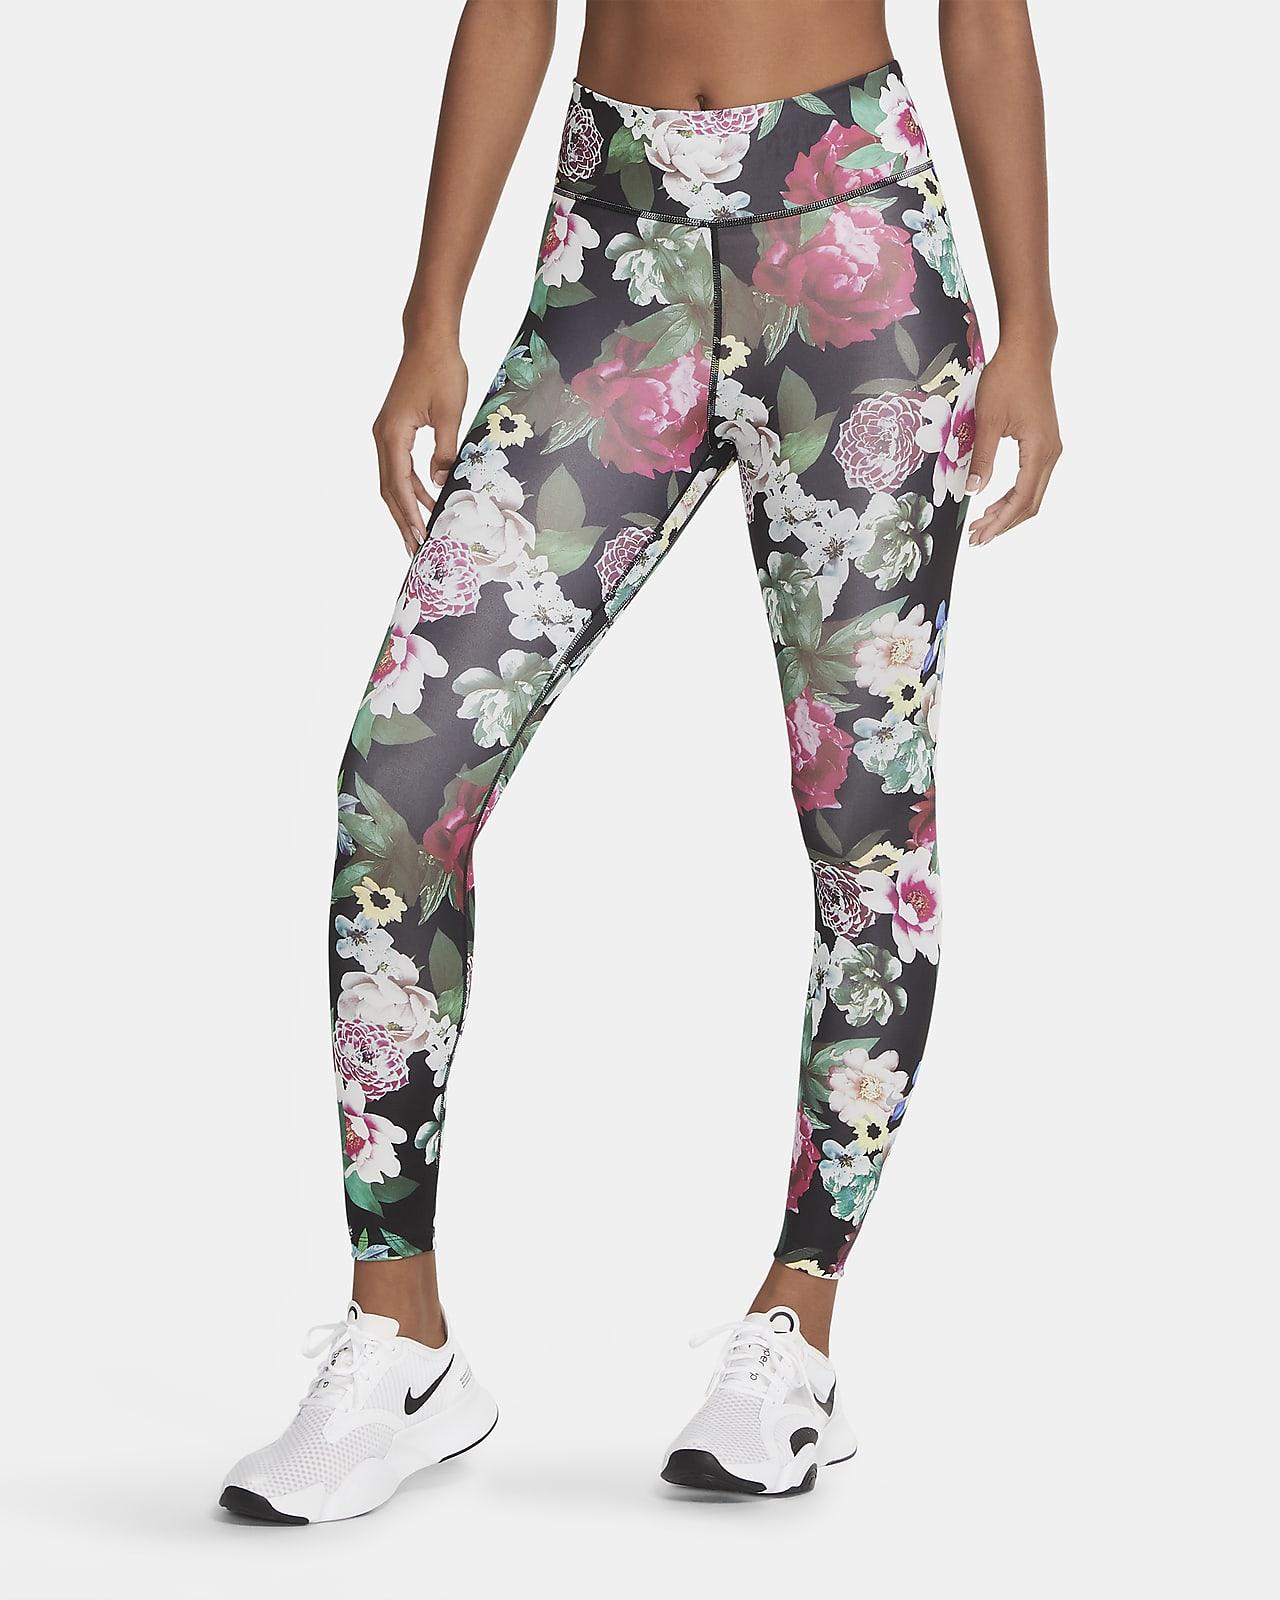 Leggings de 7/8 de acabado floral para mujer Nike One